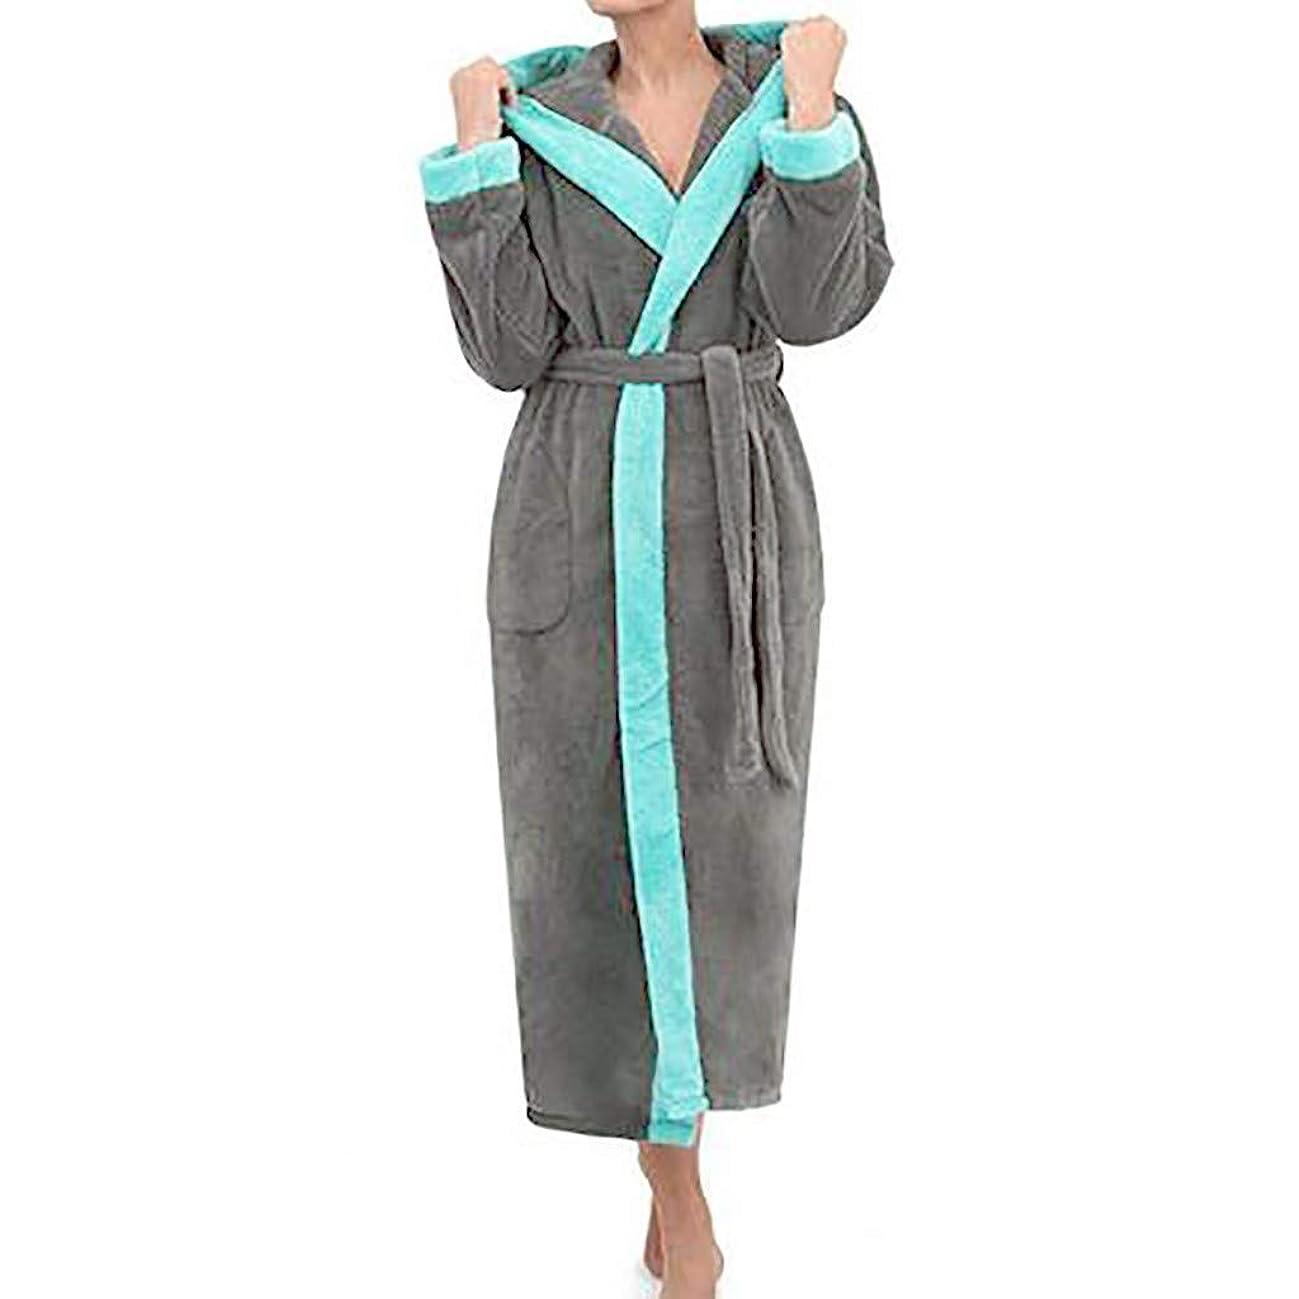 Women's Robe Winter Hooded Lengthened Long Sleeved Plush Shawl Bathrobe Kimono Robe